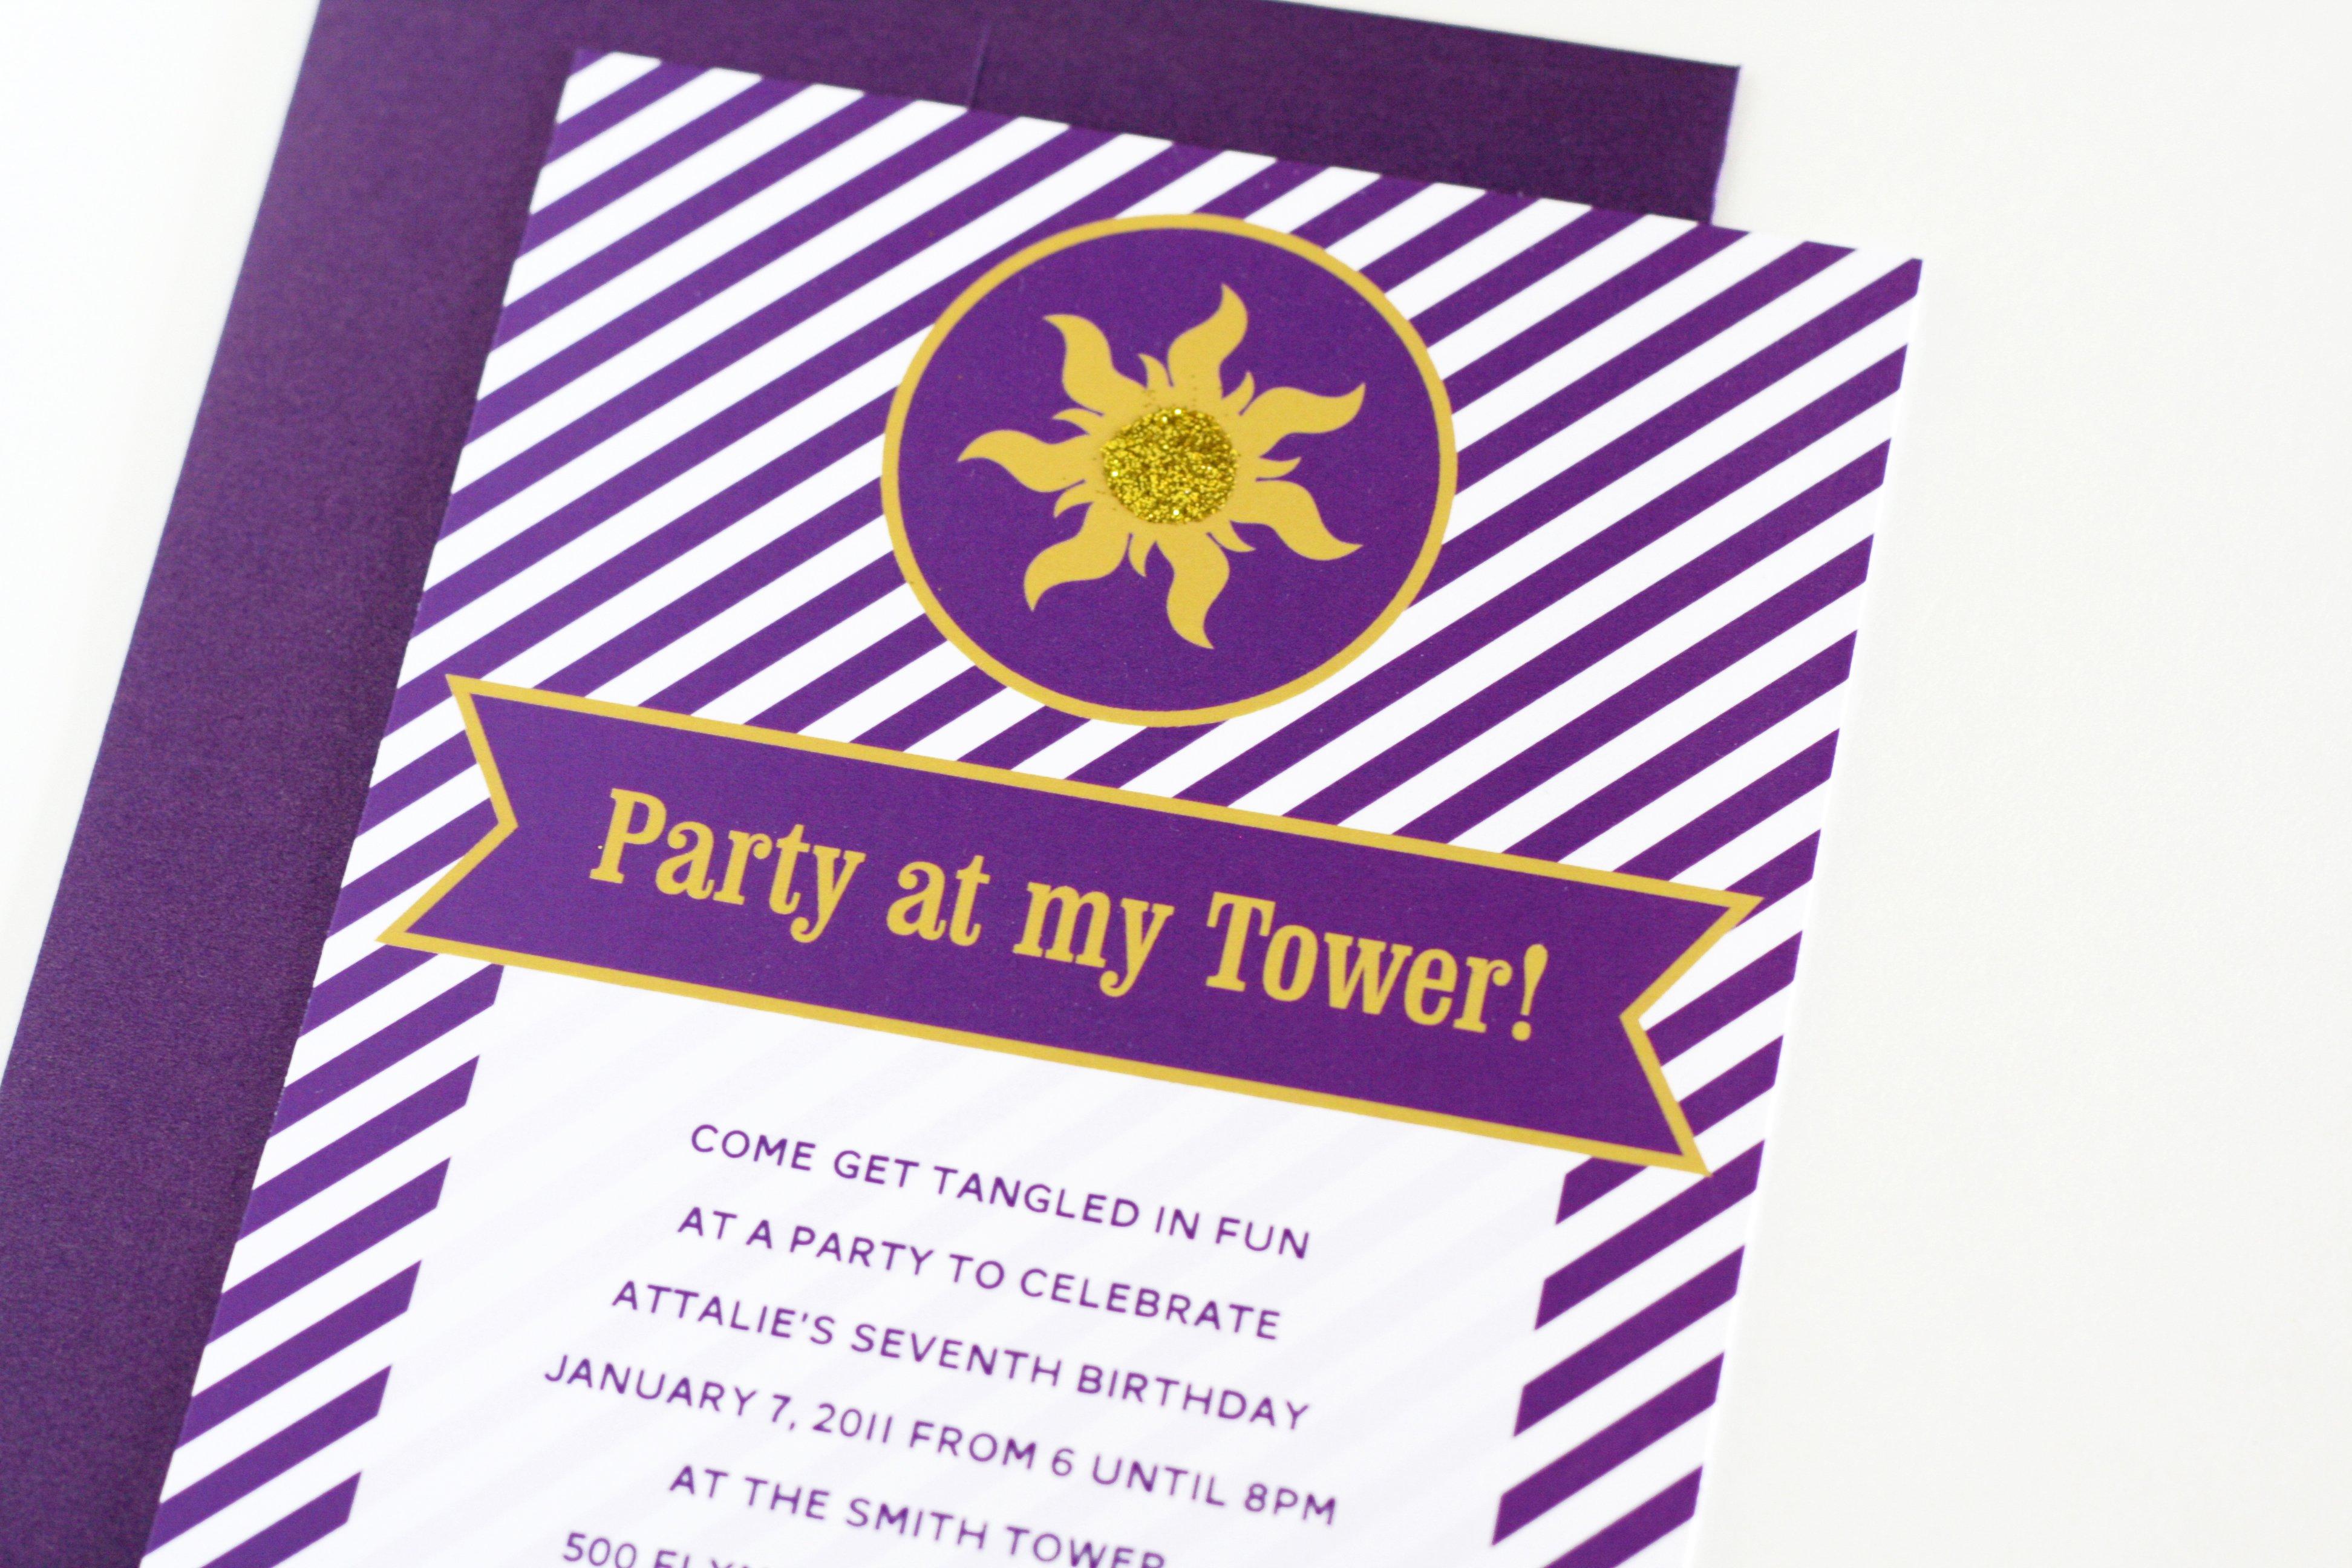 easy tangled party invites paging supermom tangledsunbirthdaypartyinvitations